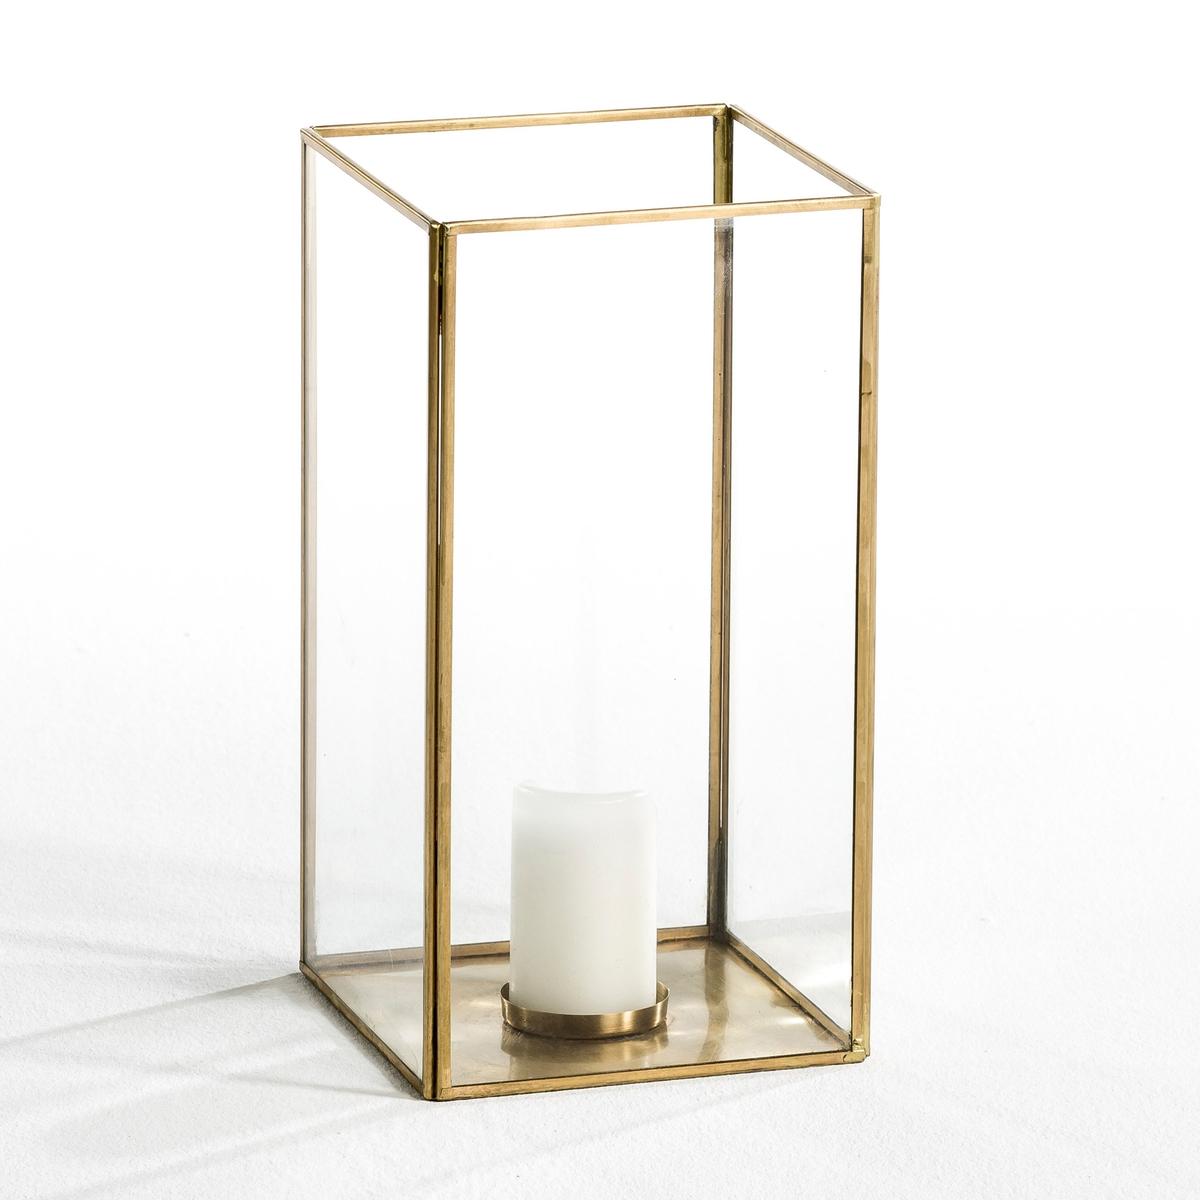 Абажур для свечи Misia, средняя модель от La Redoute